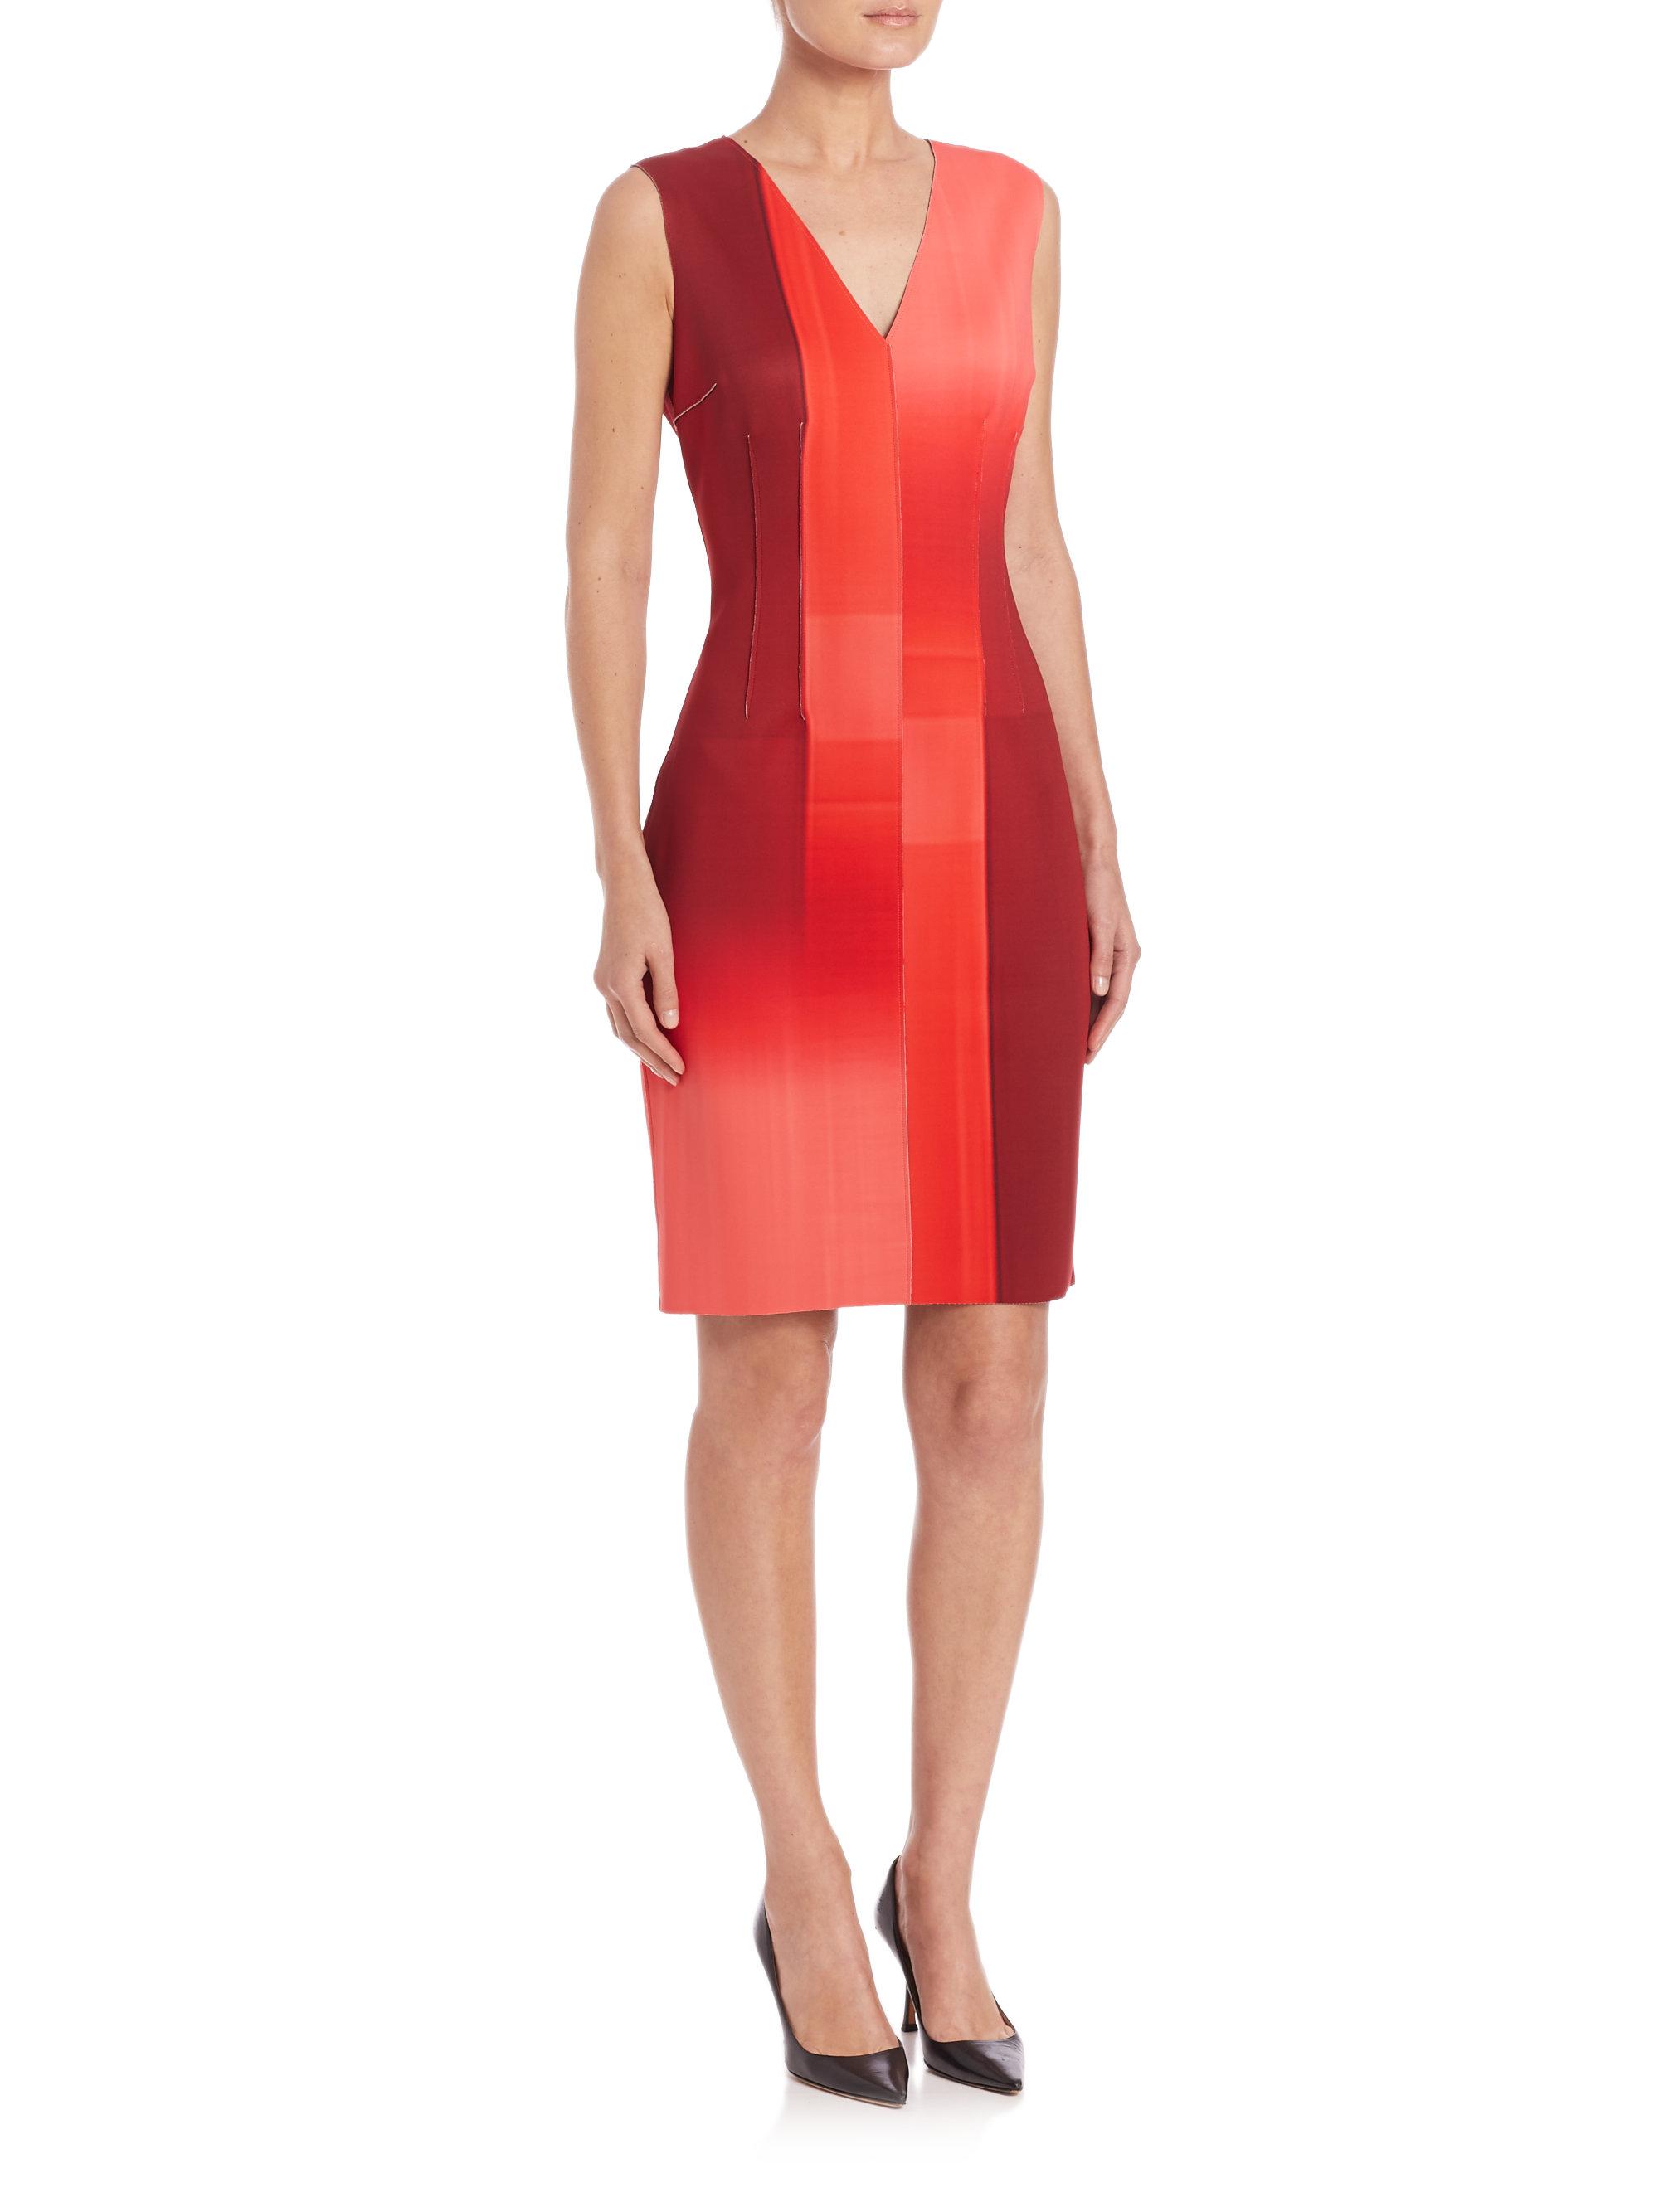 d0ccfd2f9850 Elie Tahari Gwenyth Dress in Red - Lyst